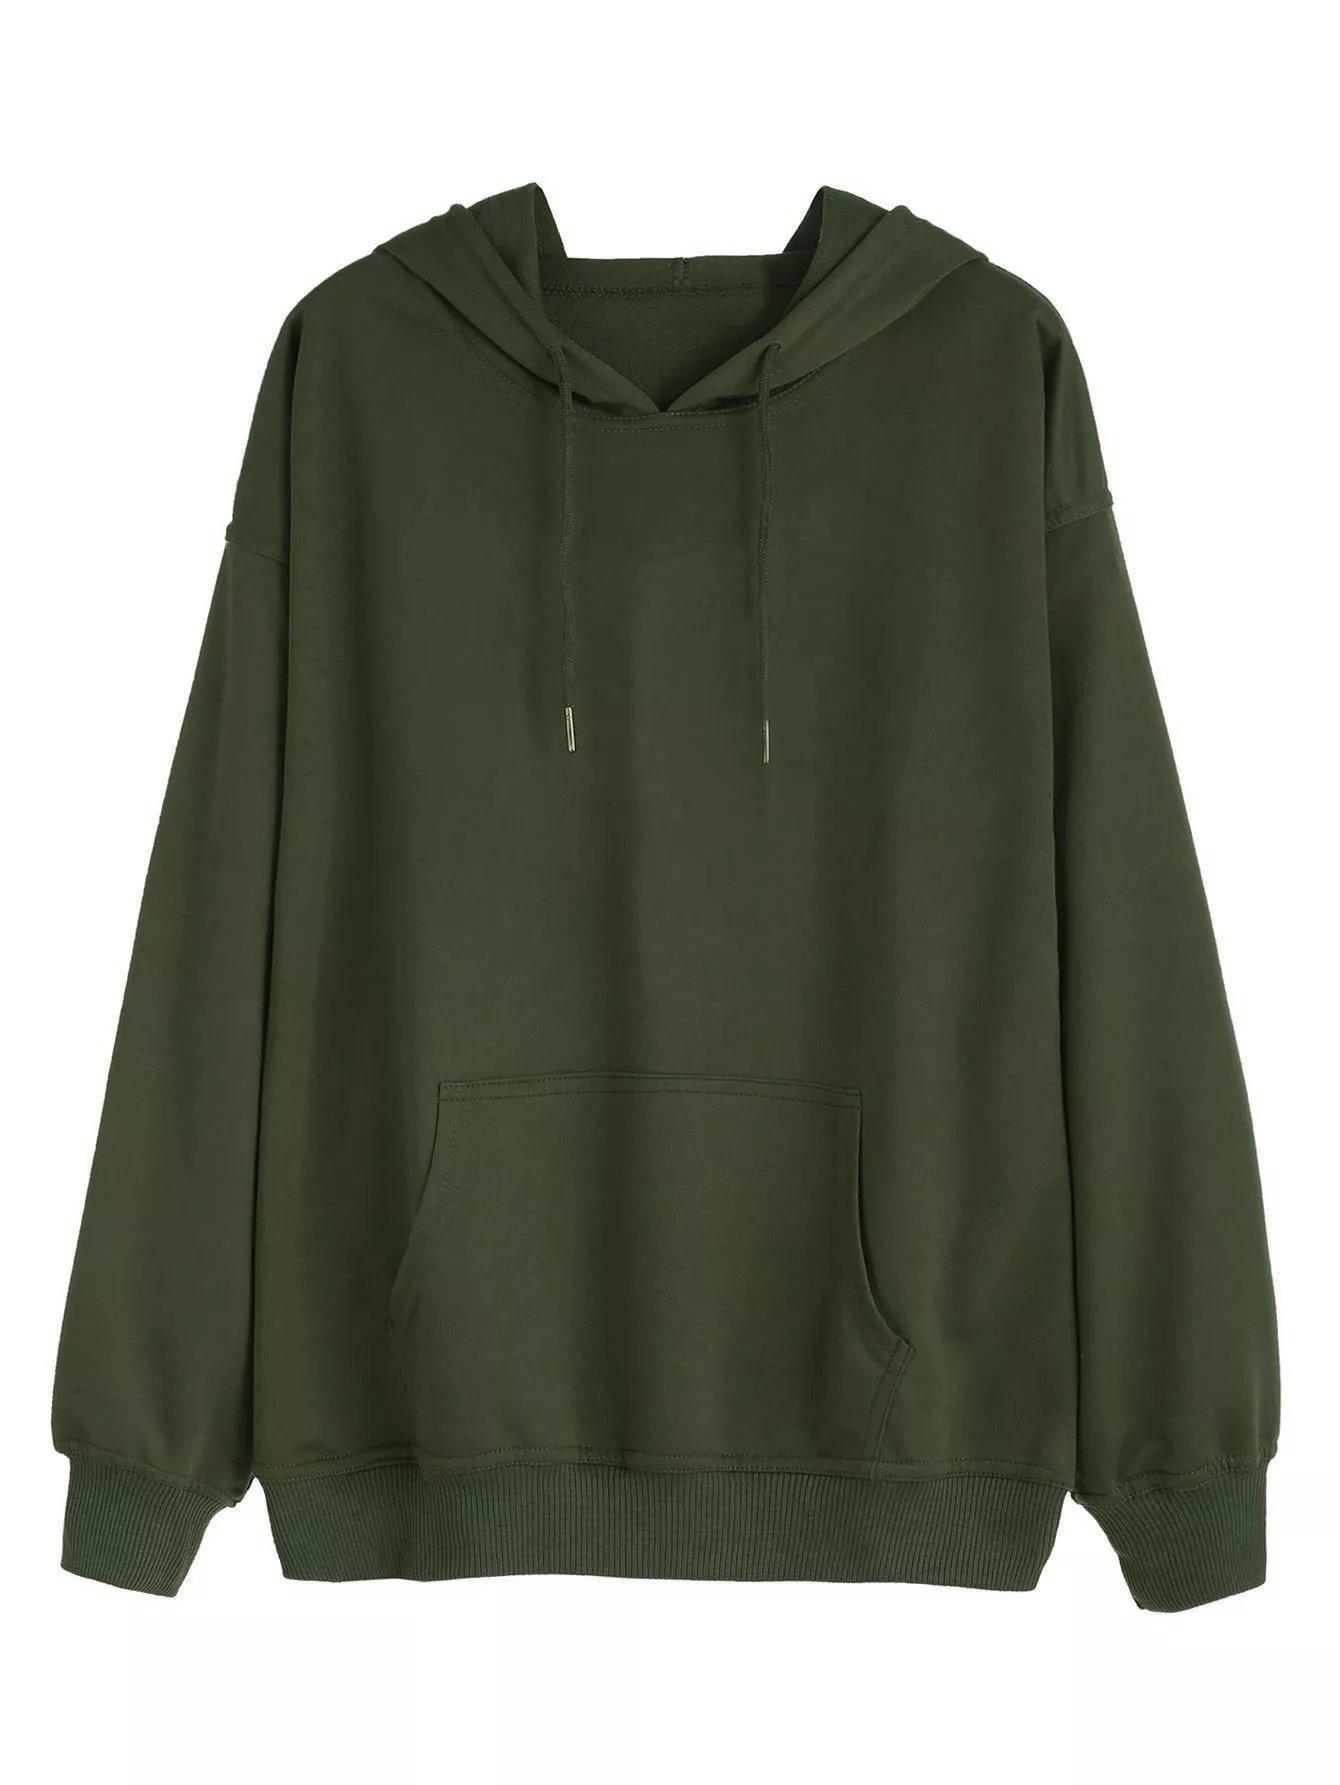 Plus Drawstring Detail Hooded Sweatshirt